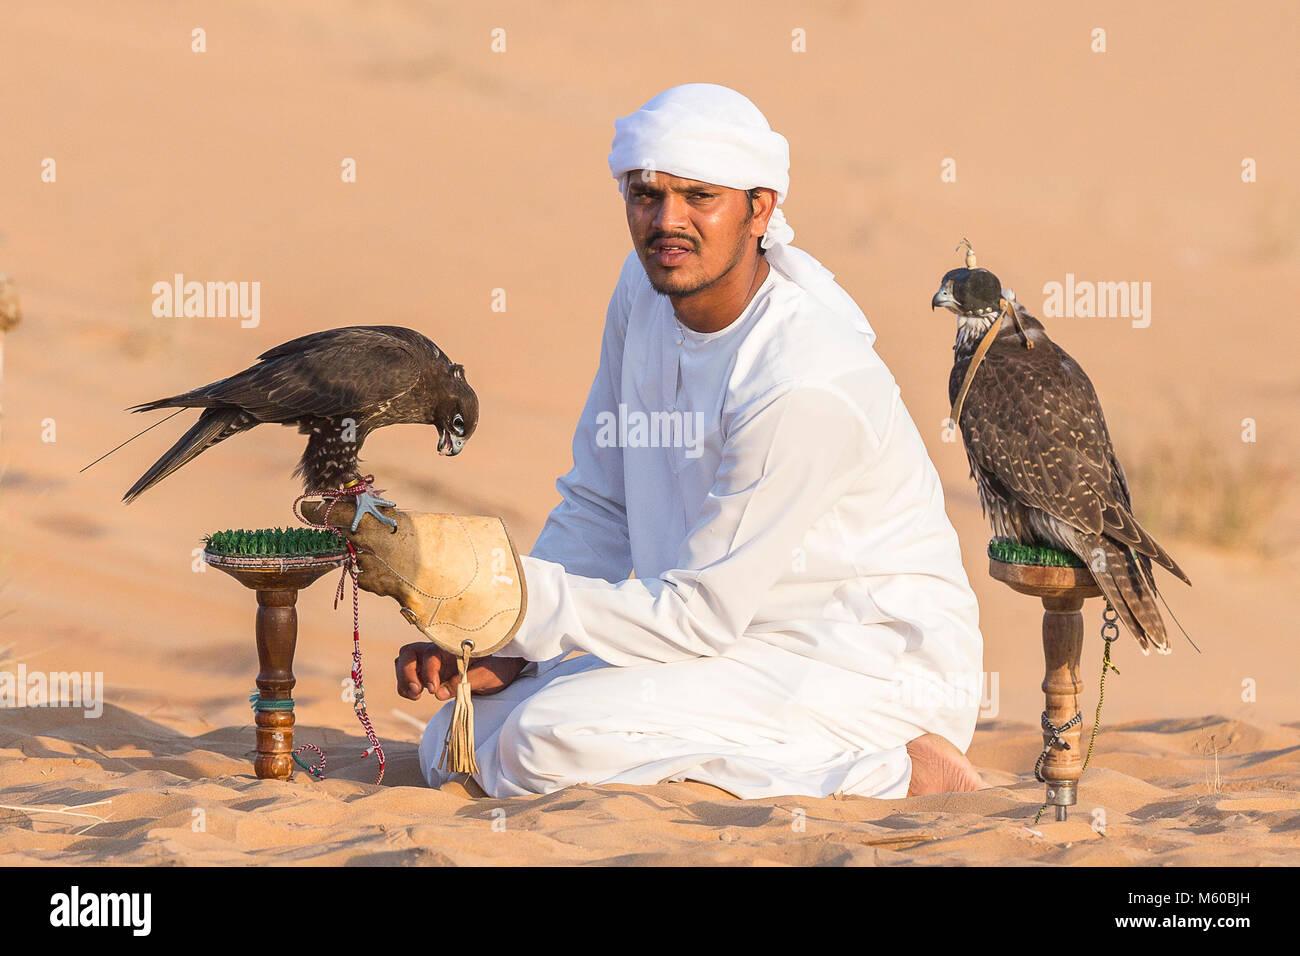 Saker Falcon (Falco cherrug). Falconer caring for trained birds on their blocks in the desert. Abu Dhabi - Stock Image